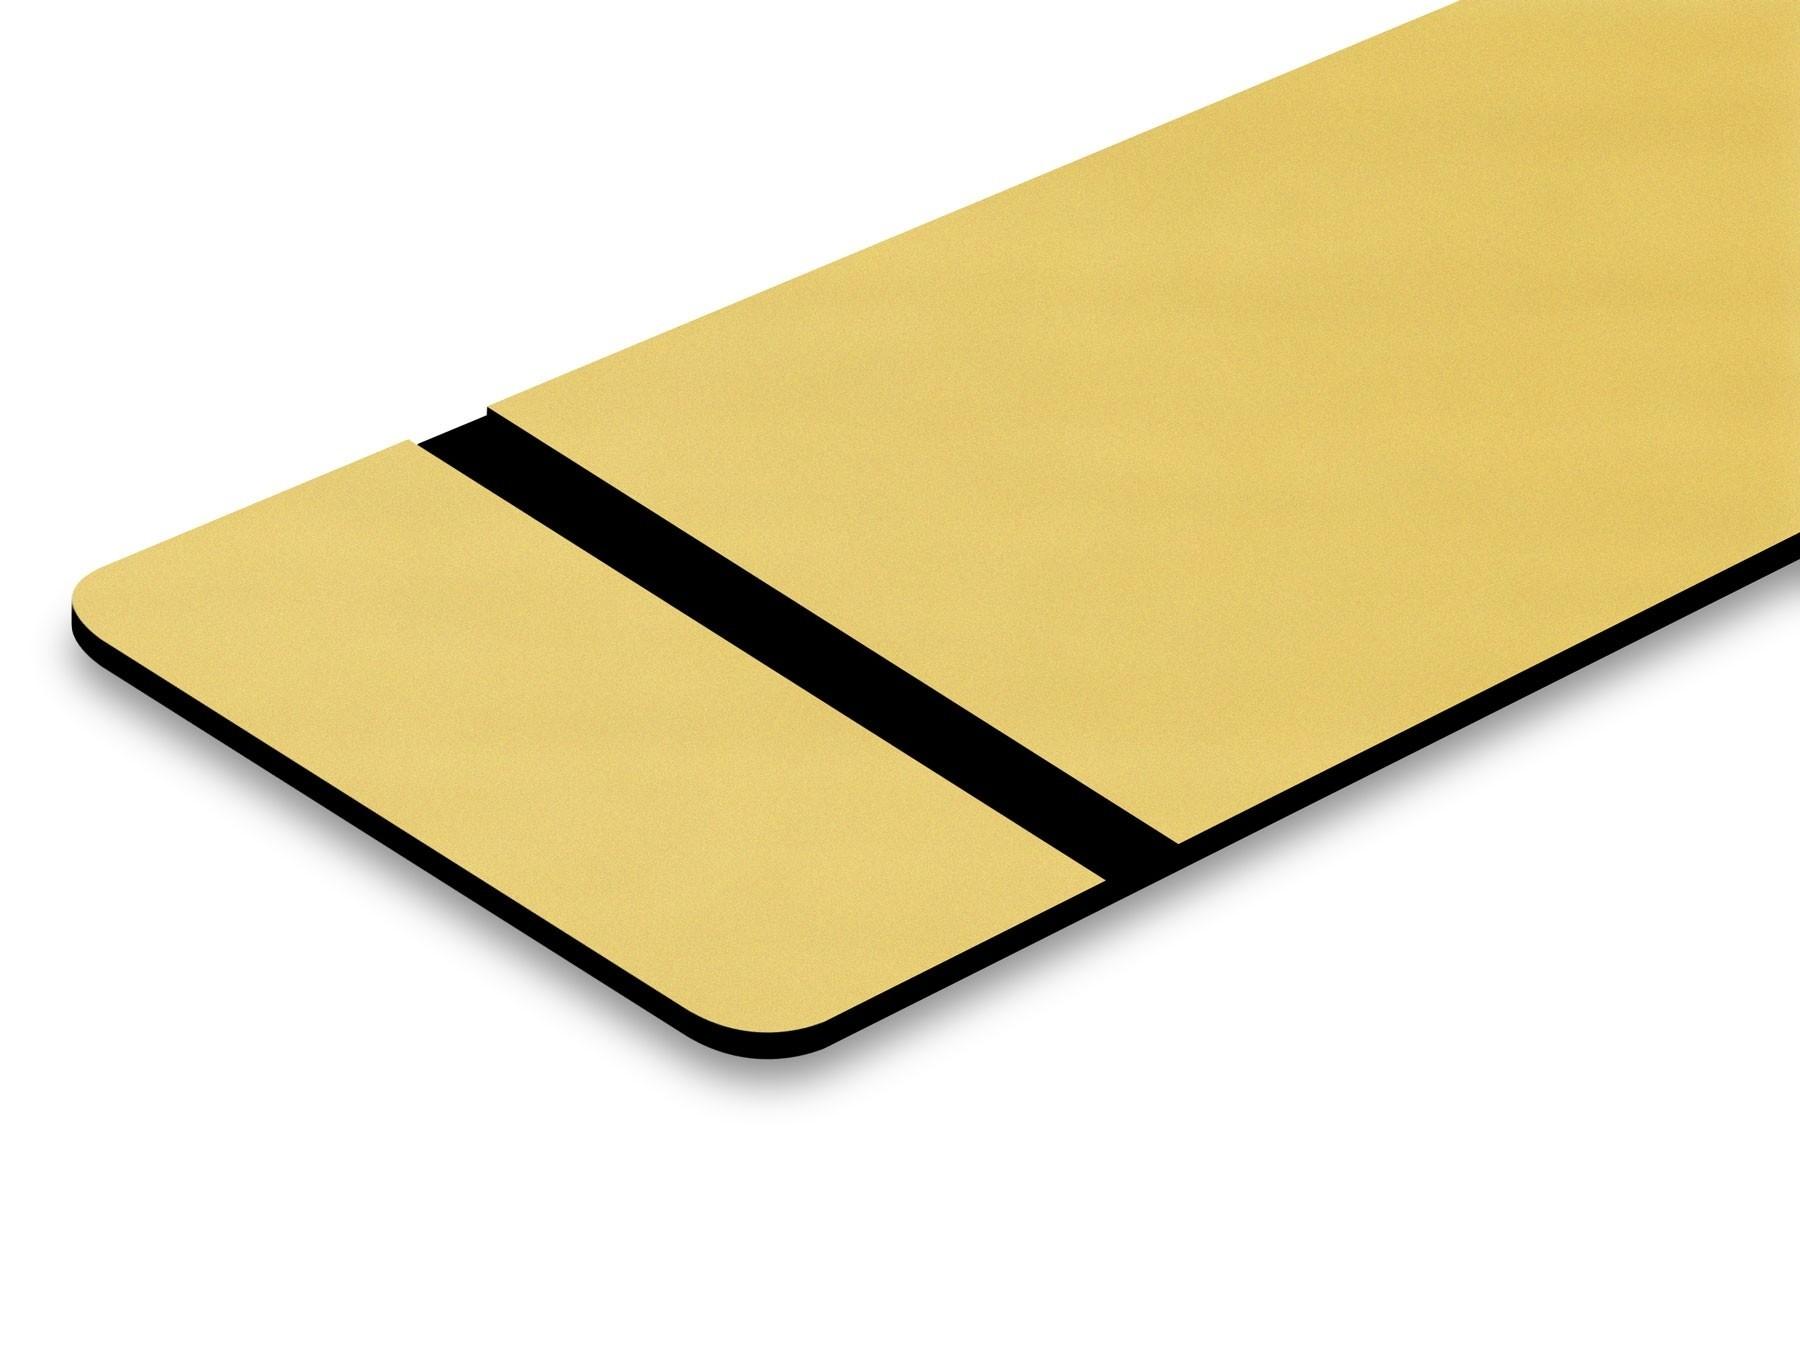 TroLase Thins, European Gold/Black, 2ply, 0.5 mm